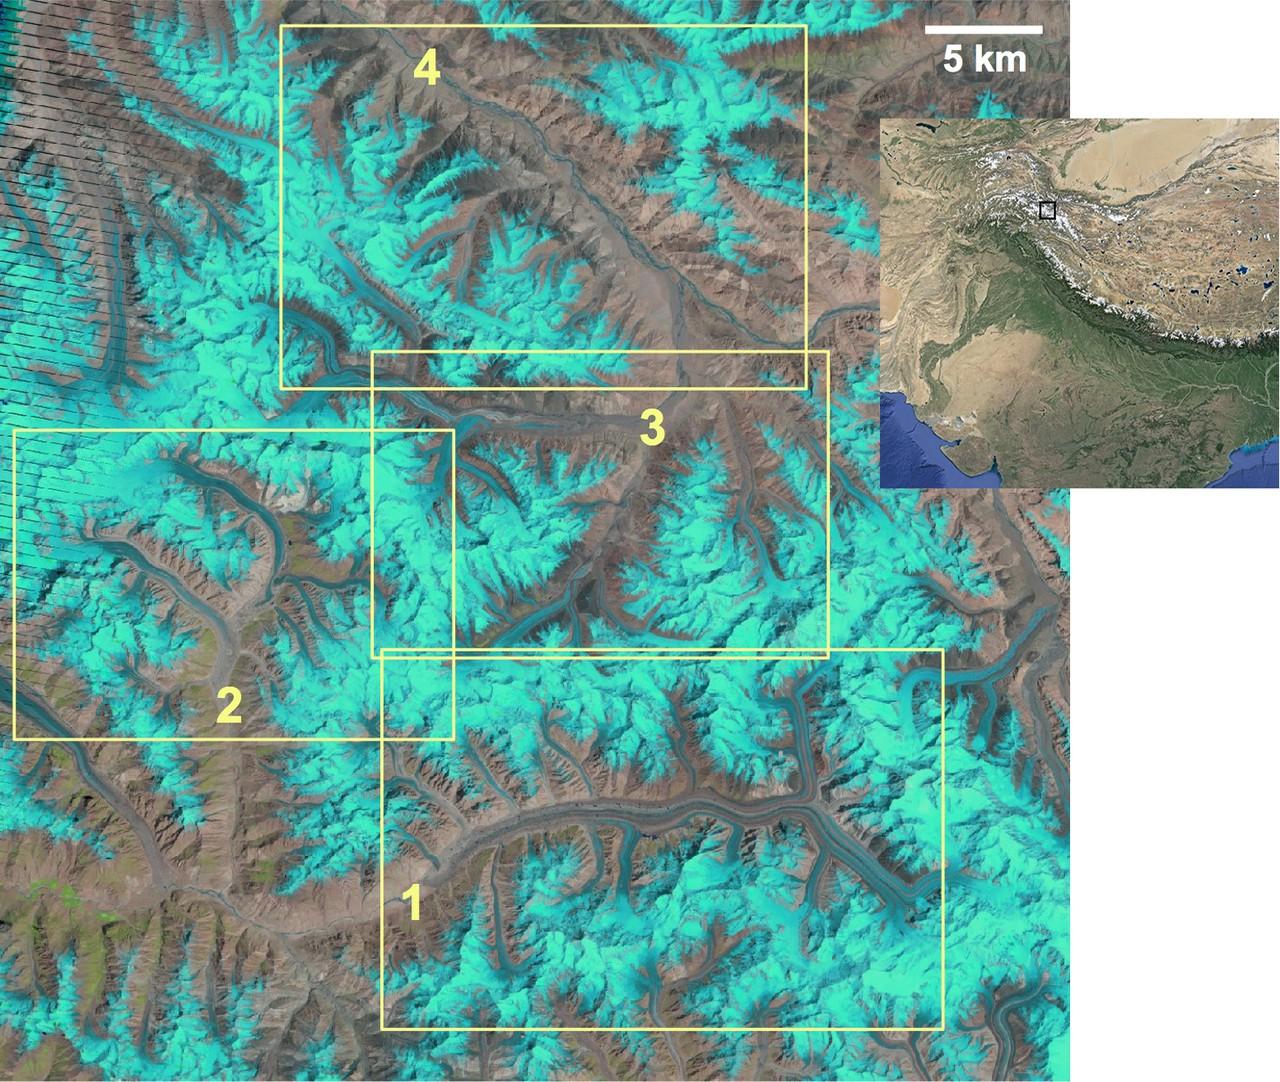 Satellite image of the study region in the Karakoram (Credit: F. Paul, The Cryosphere, 2015 & USGS/NASA & Google Earth)